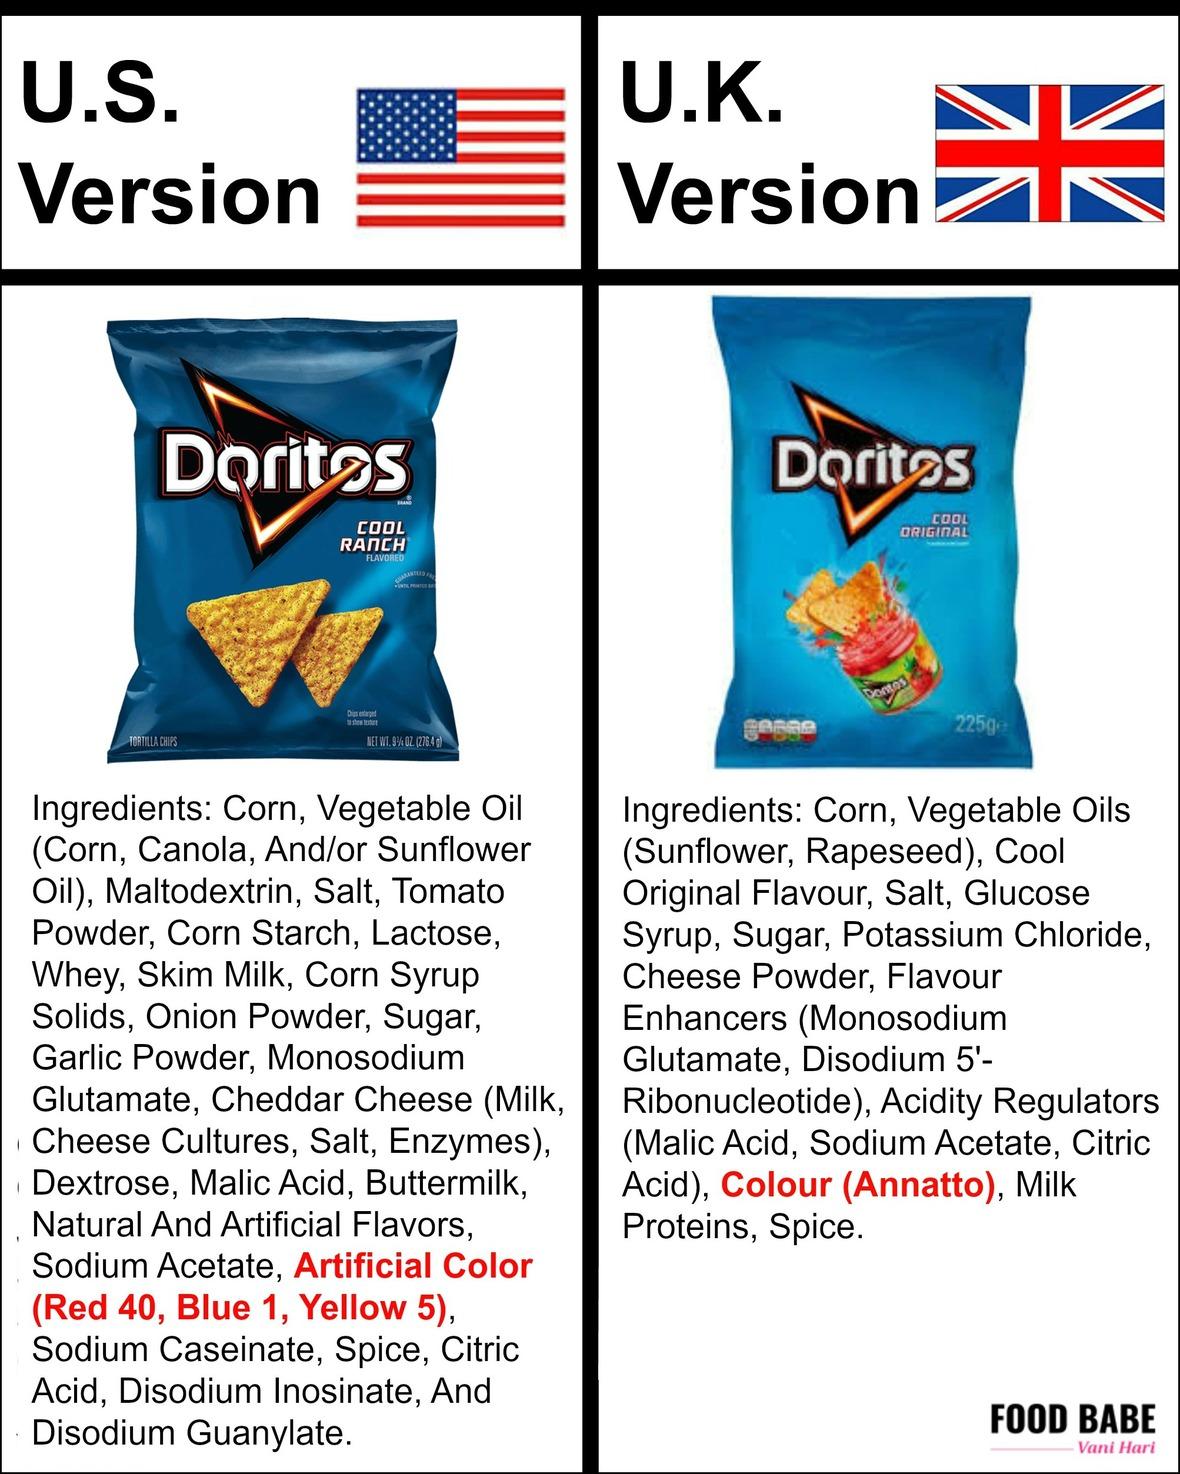 U.S.-vs.-Uk-doritos-ingredients